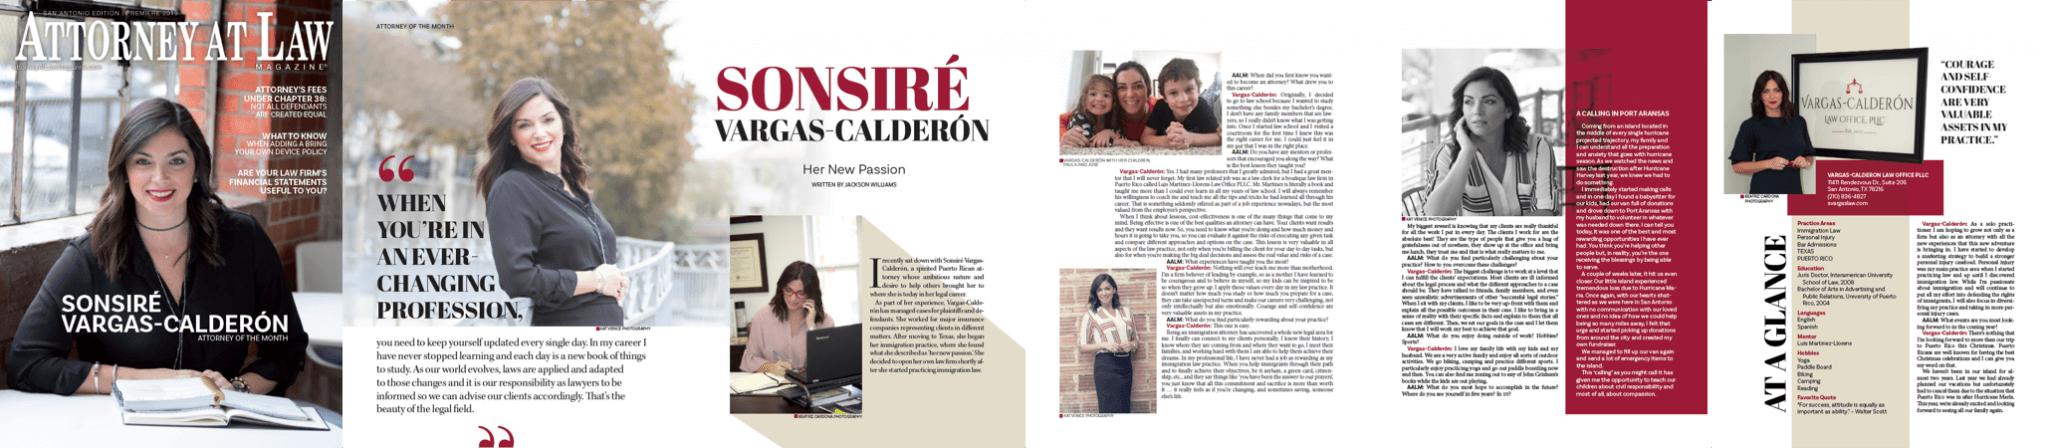 Sonsiré Vargas-Calderón